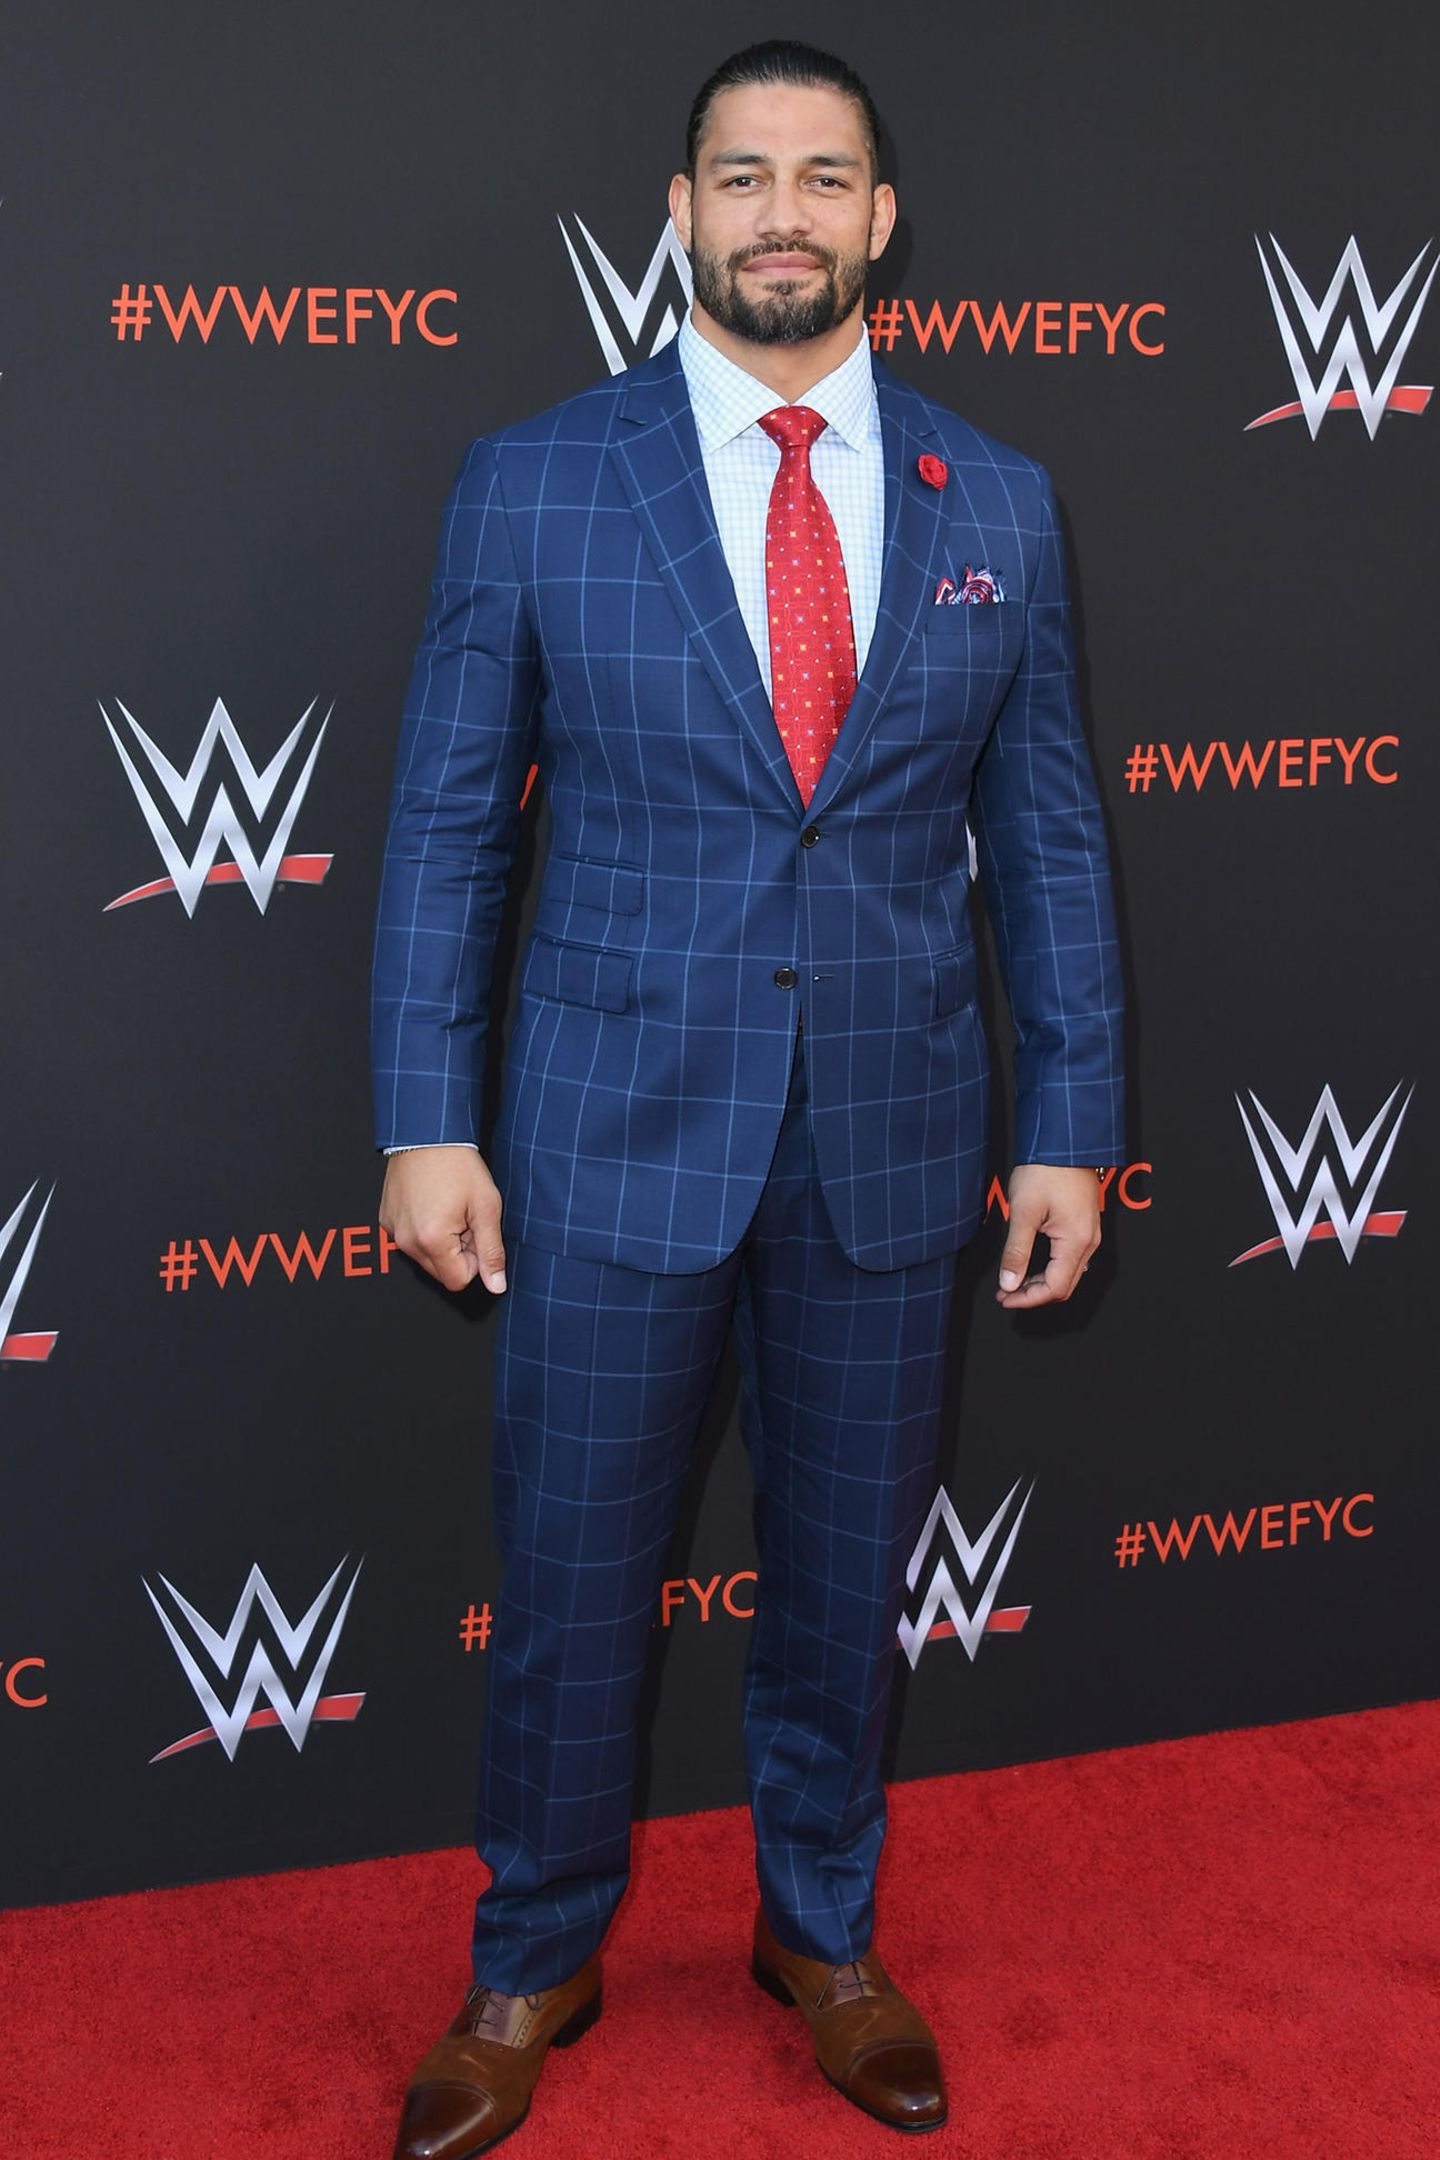 WWE-Profi-Wrestler Roman Reigns